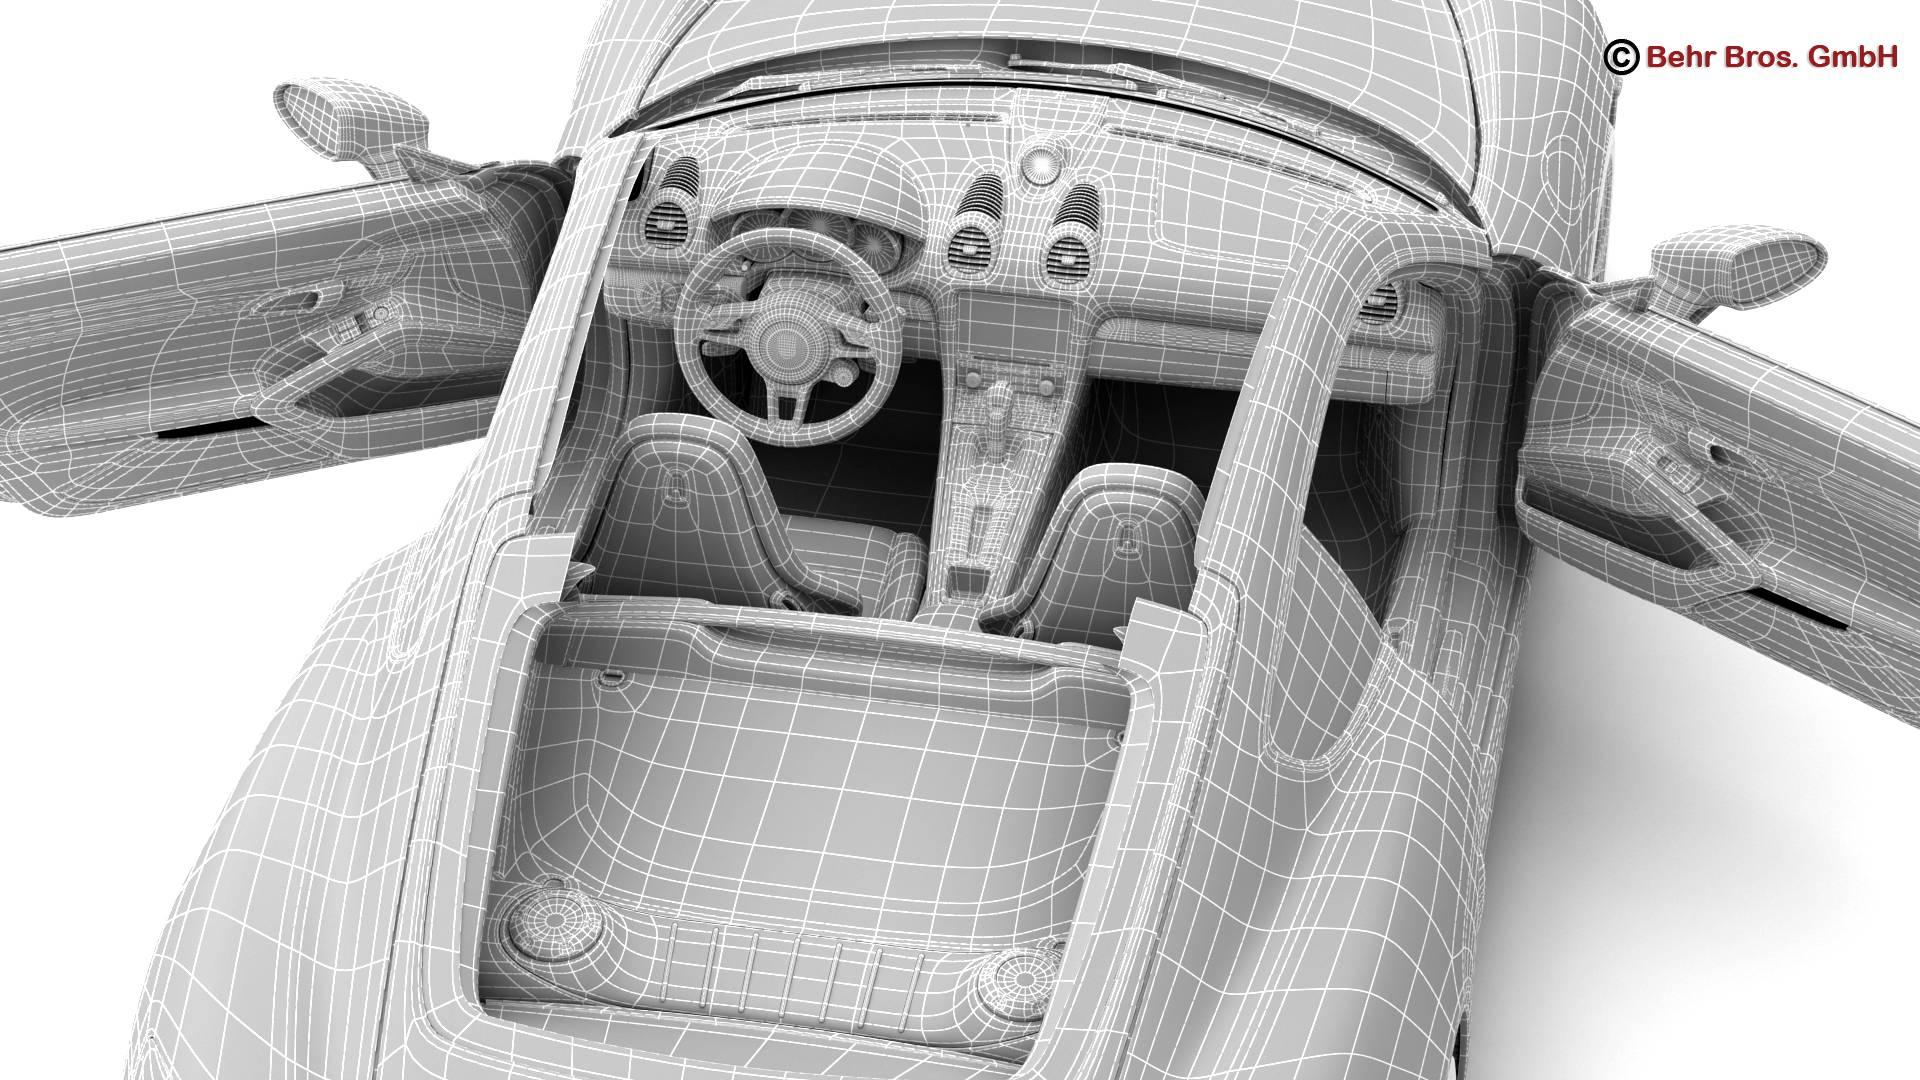 porsche 718 cayman 2017 3d model 3ds max fbx c4d lwo ma mb obj 220097